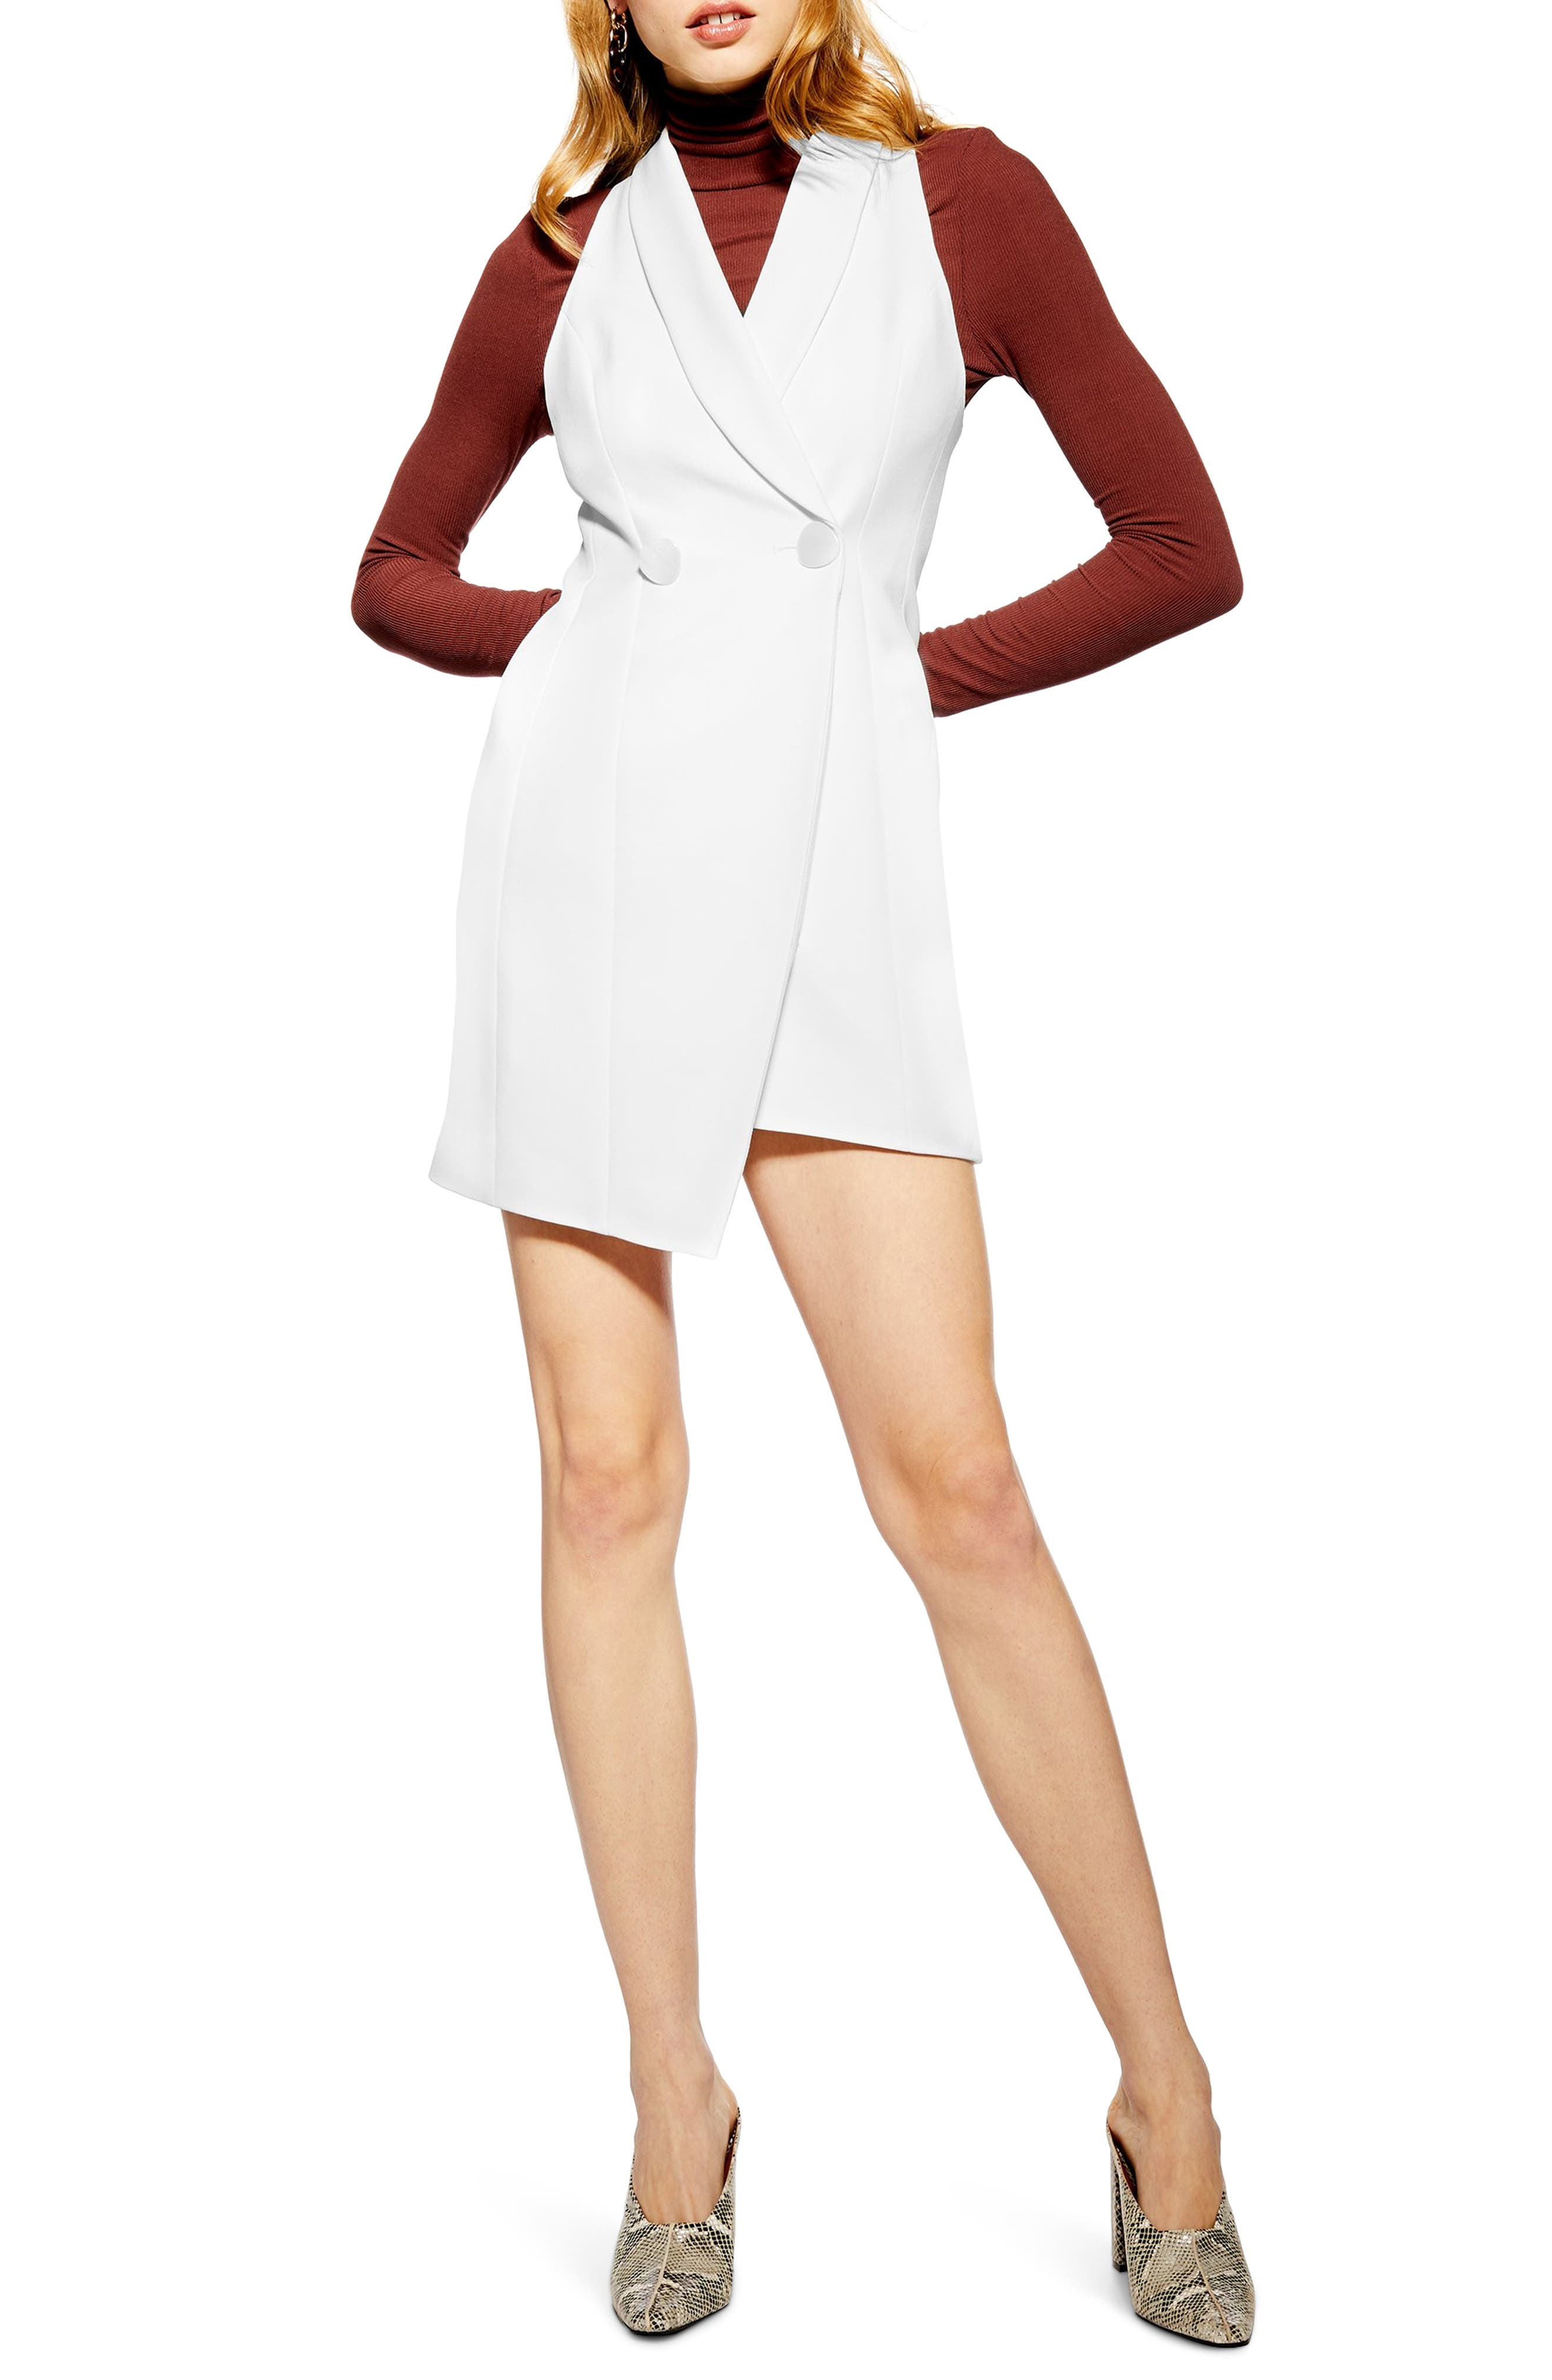 Topshop Sleeveless Tuxedo Minidress, US (fits like 6-8) - White